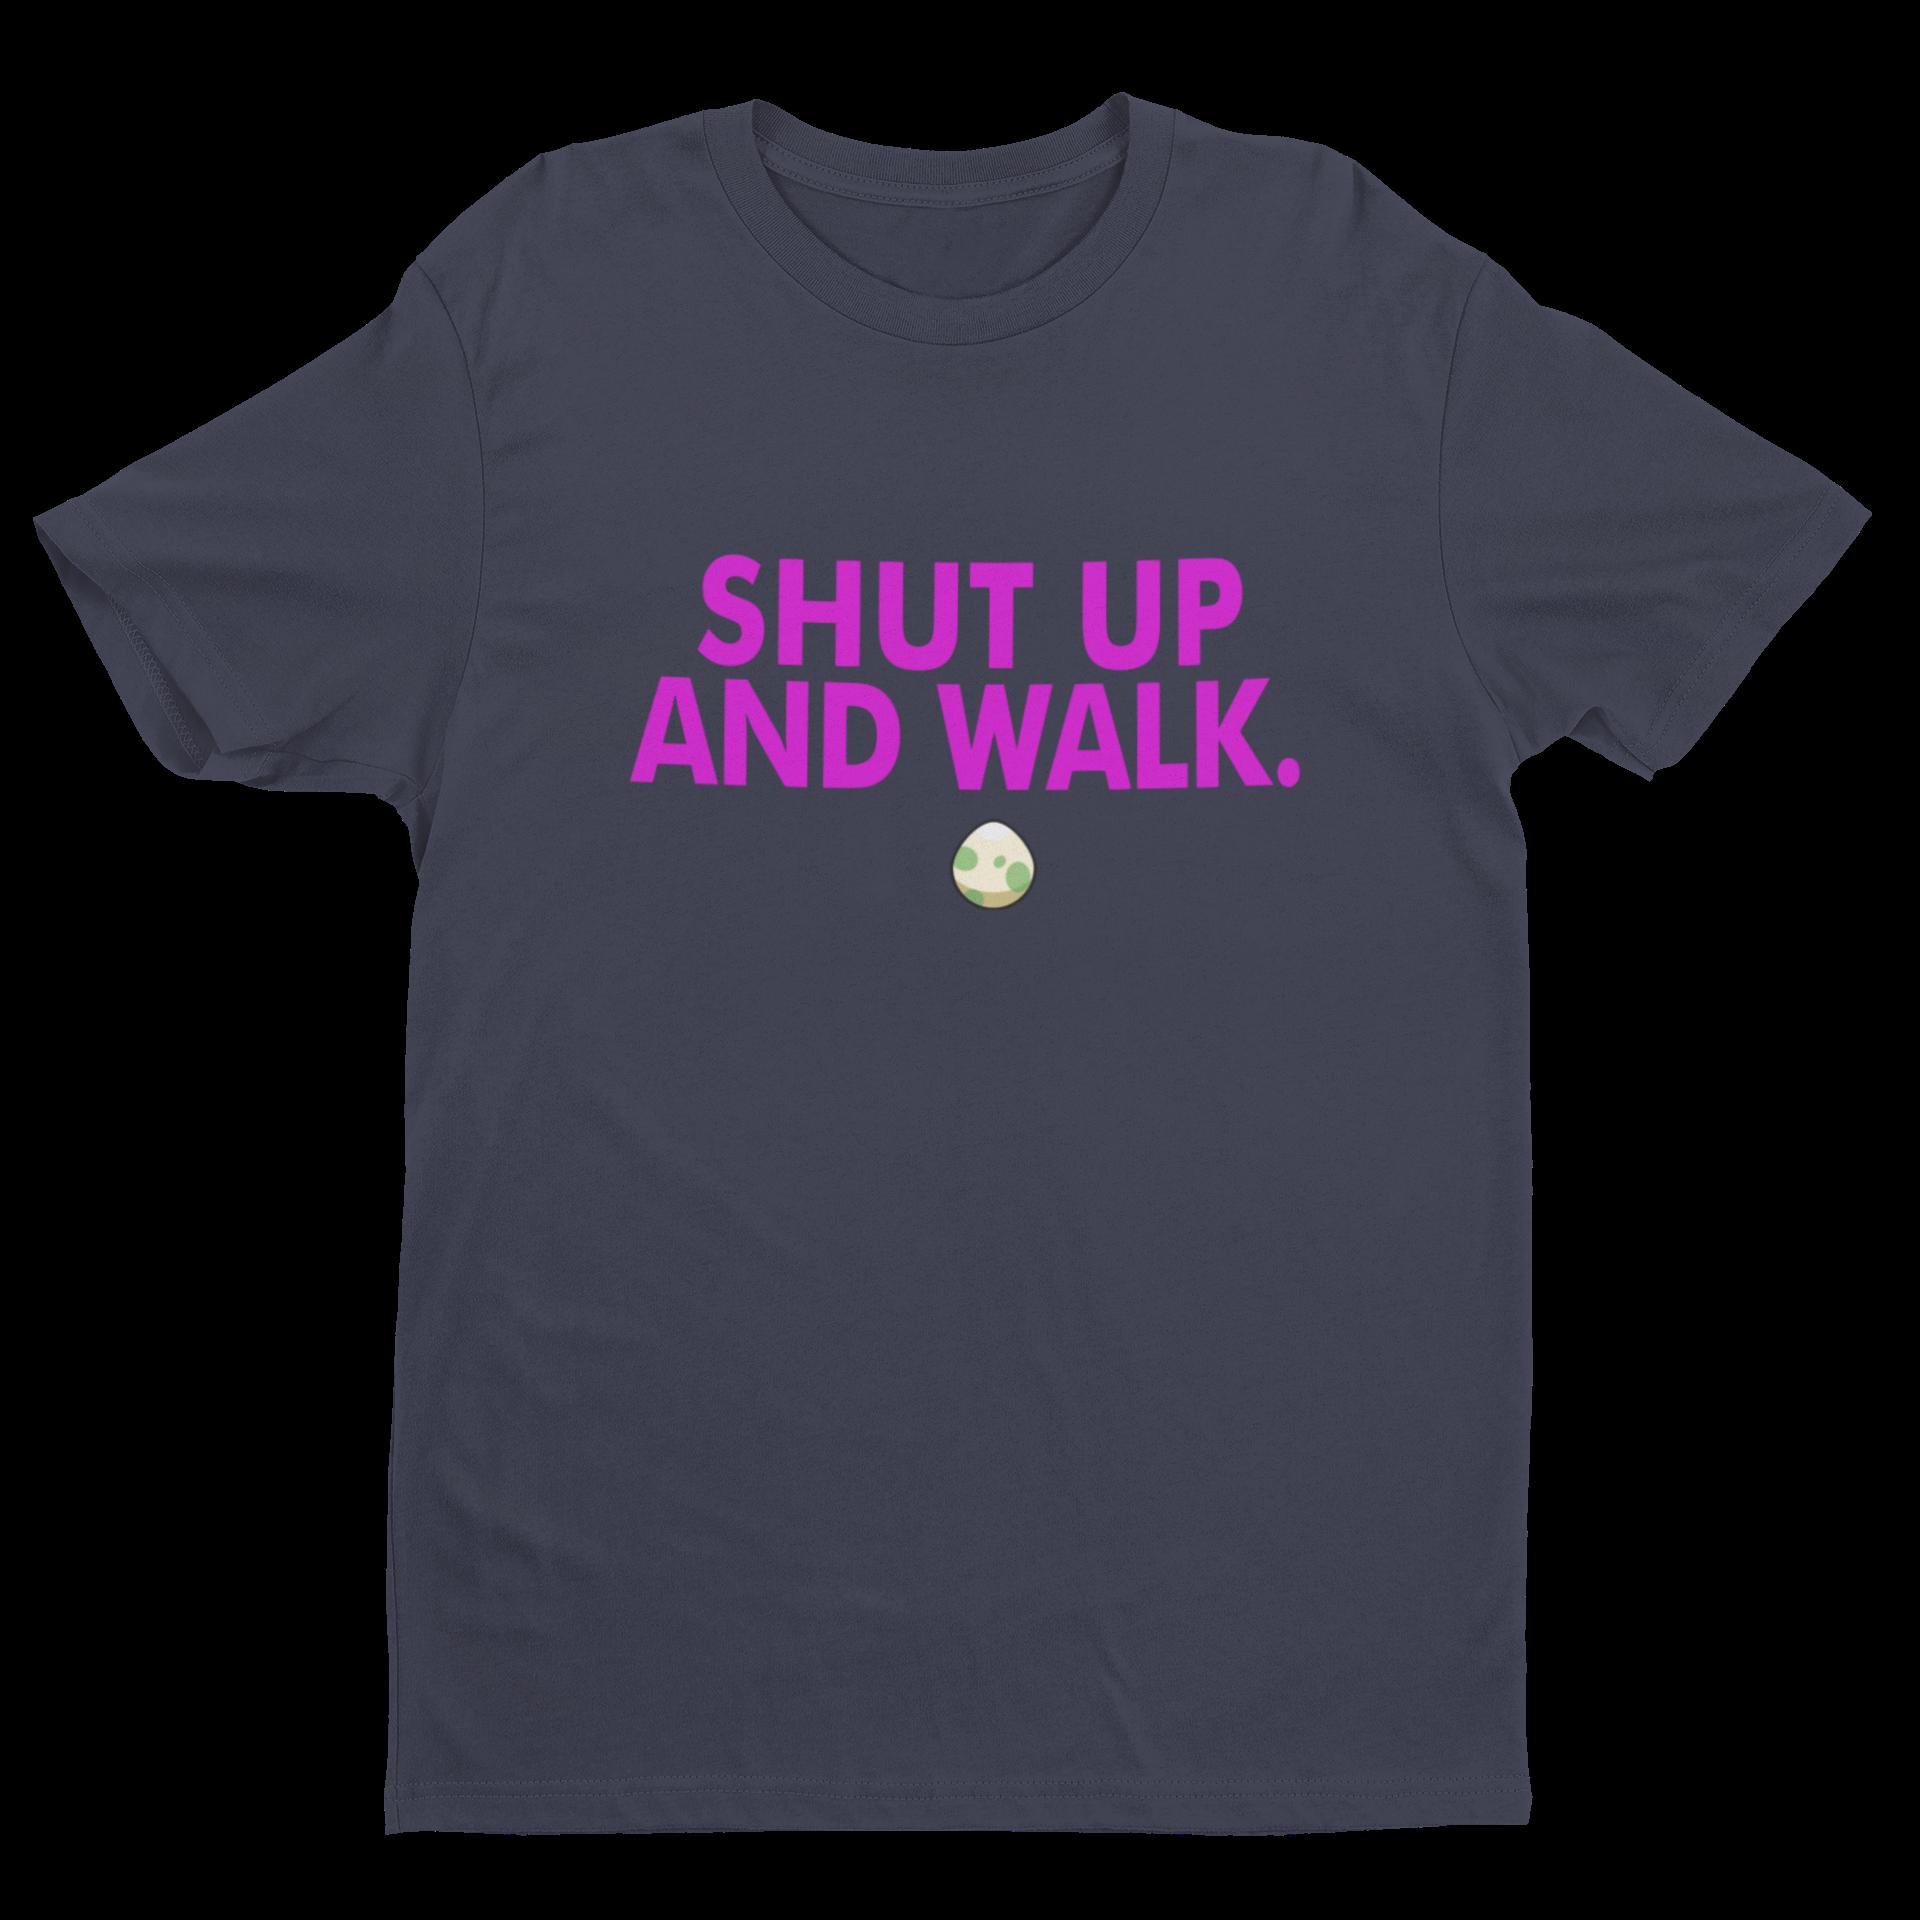 Shut Up and Walk Crew Neck S-Sleeve T-shirt